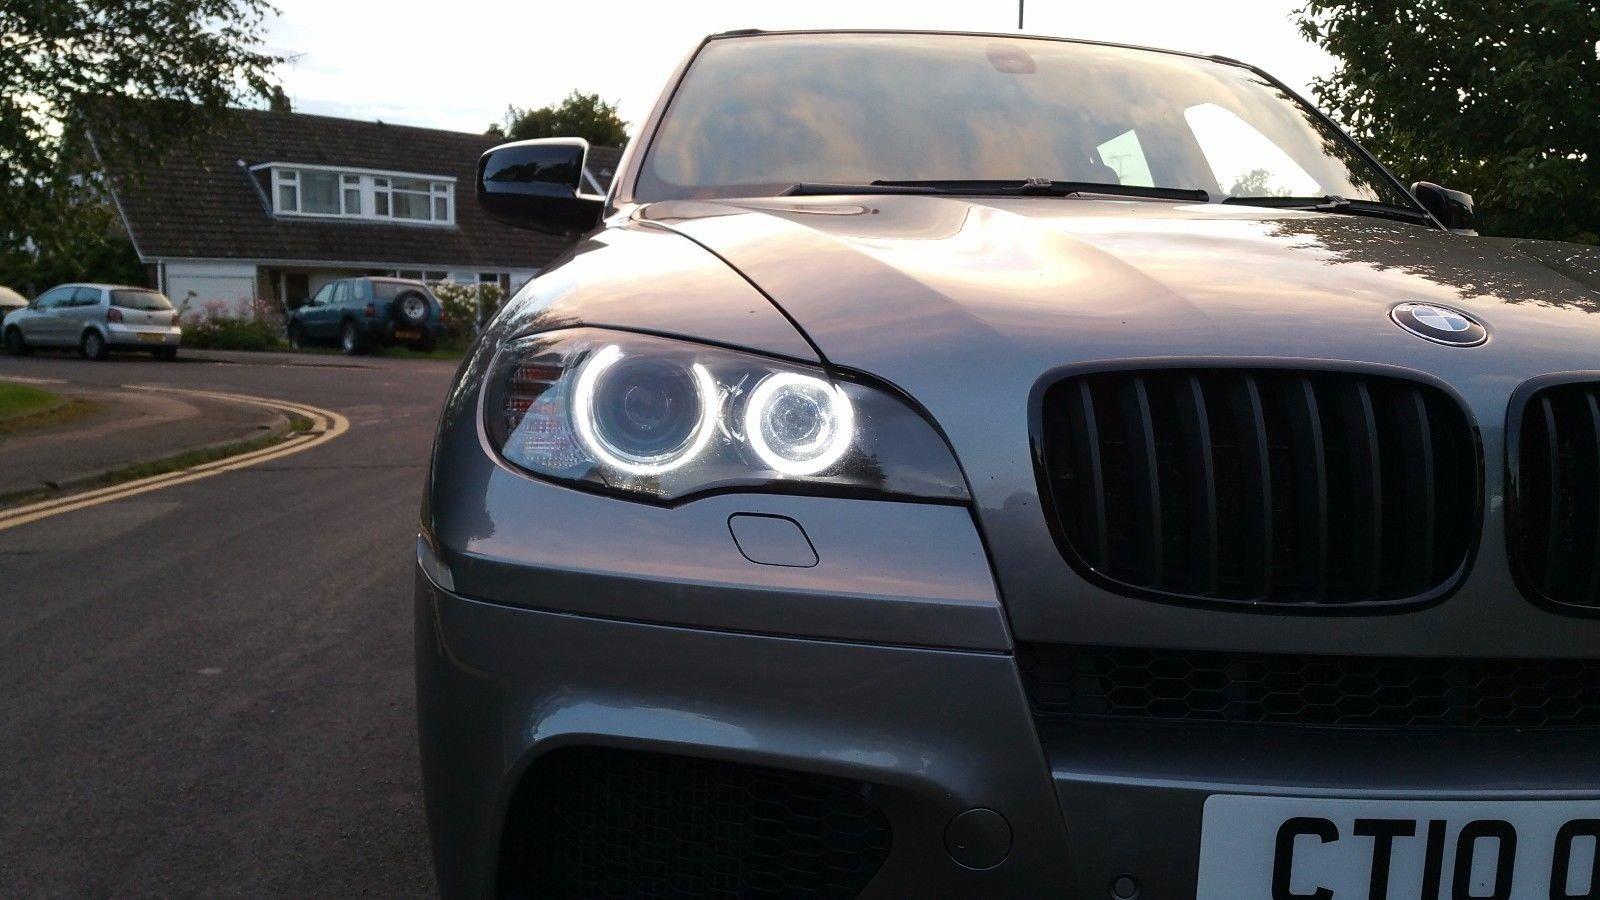 CANBUS TERMINATOR LED Headlight Conversion Kit H7 FOR BMW E90 LCI E91 E81 E87